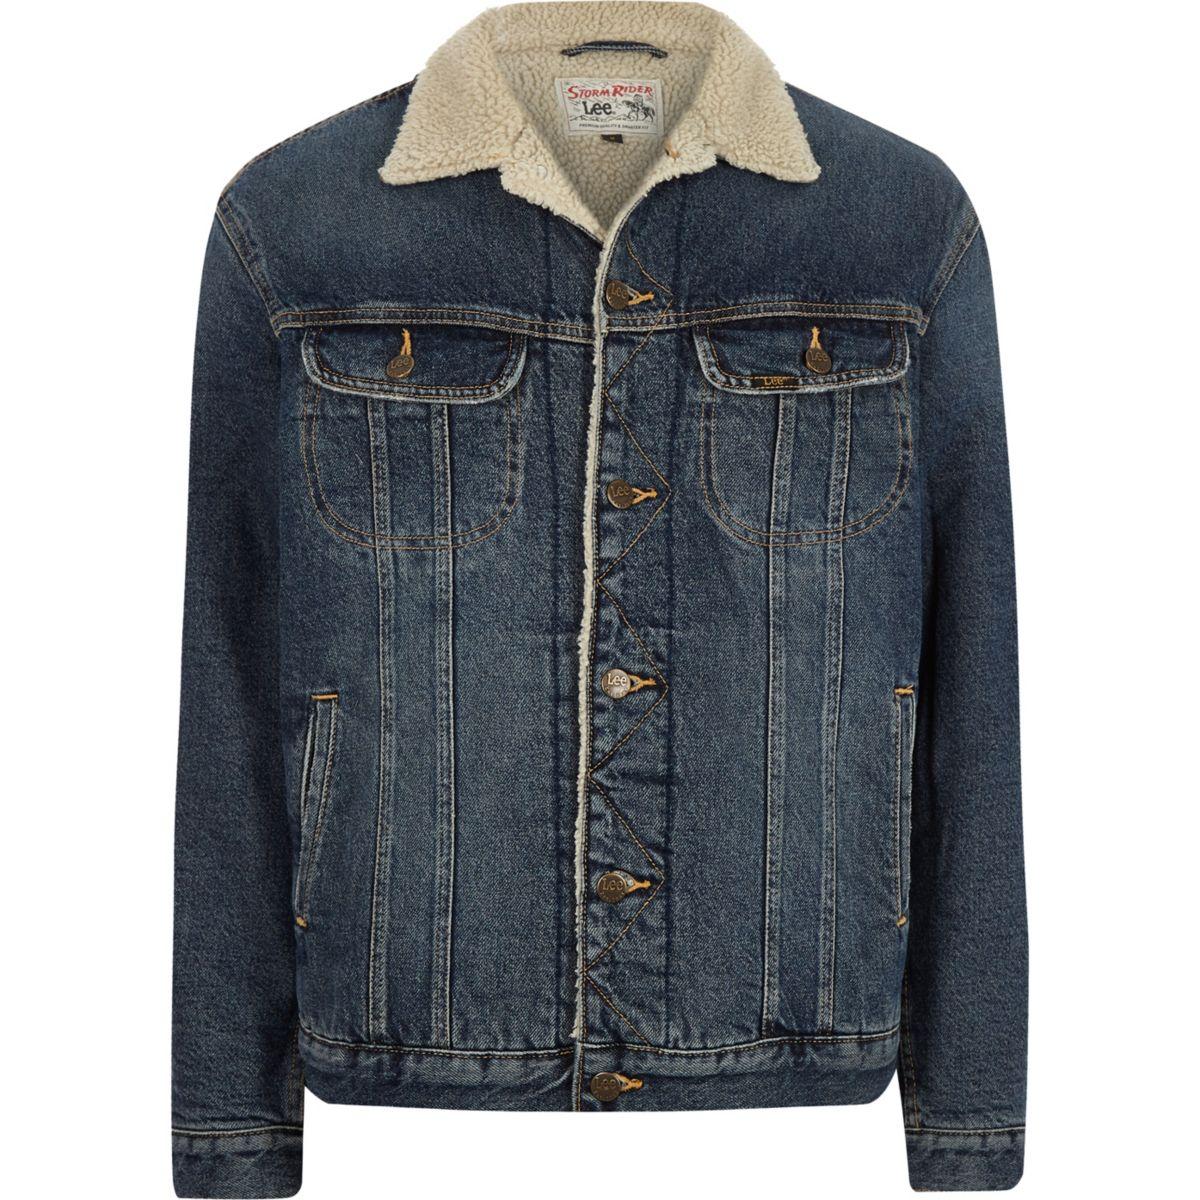 Lee blue borg collar denim jacket